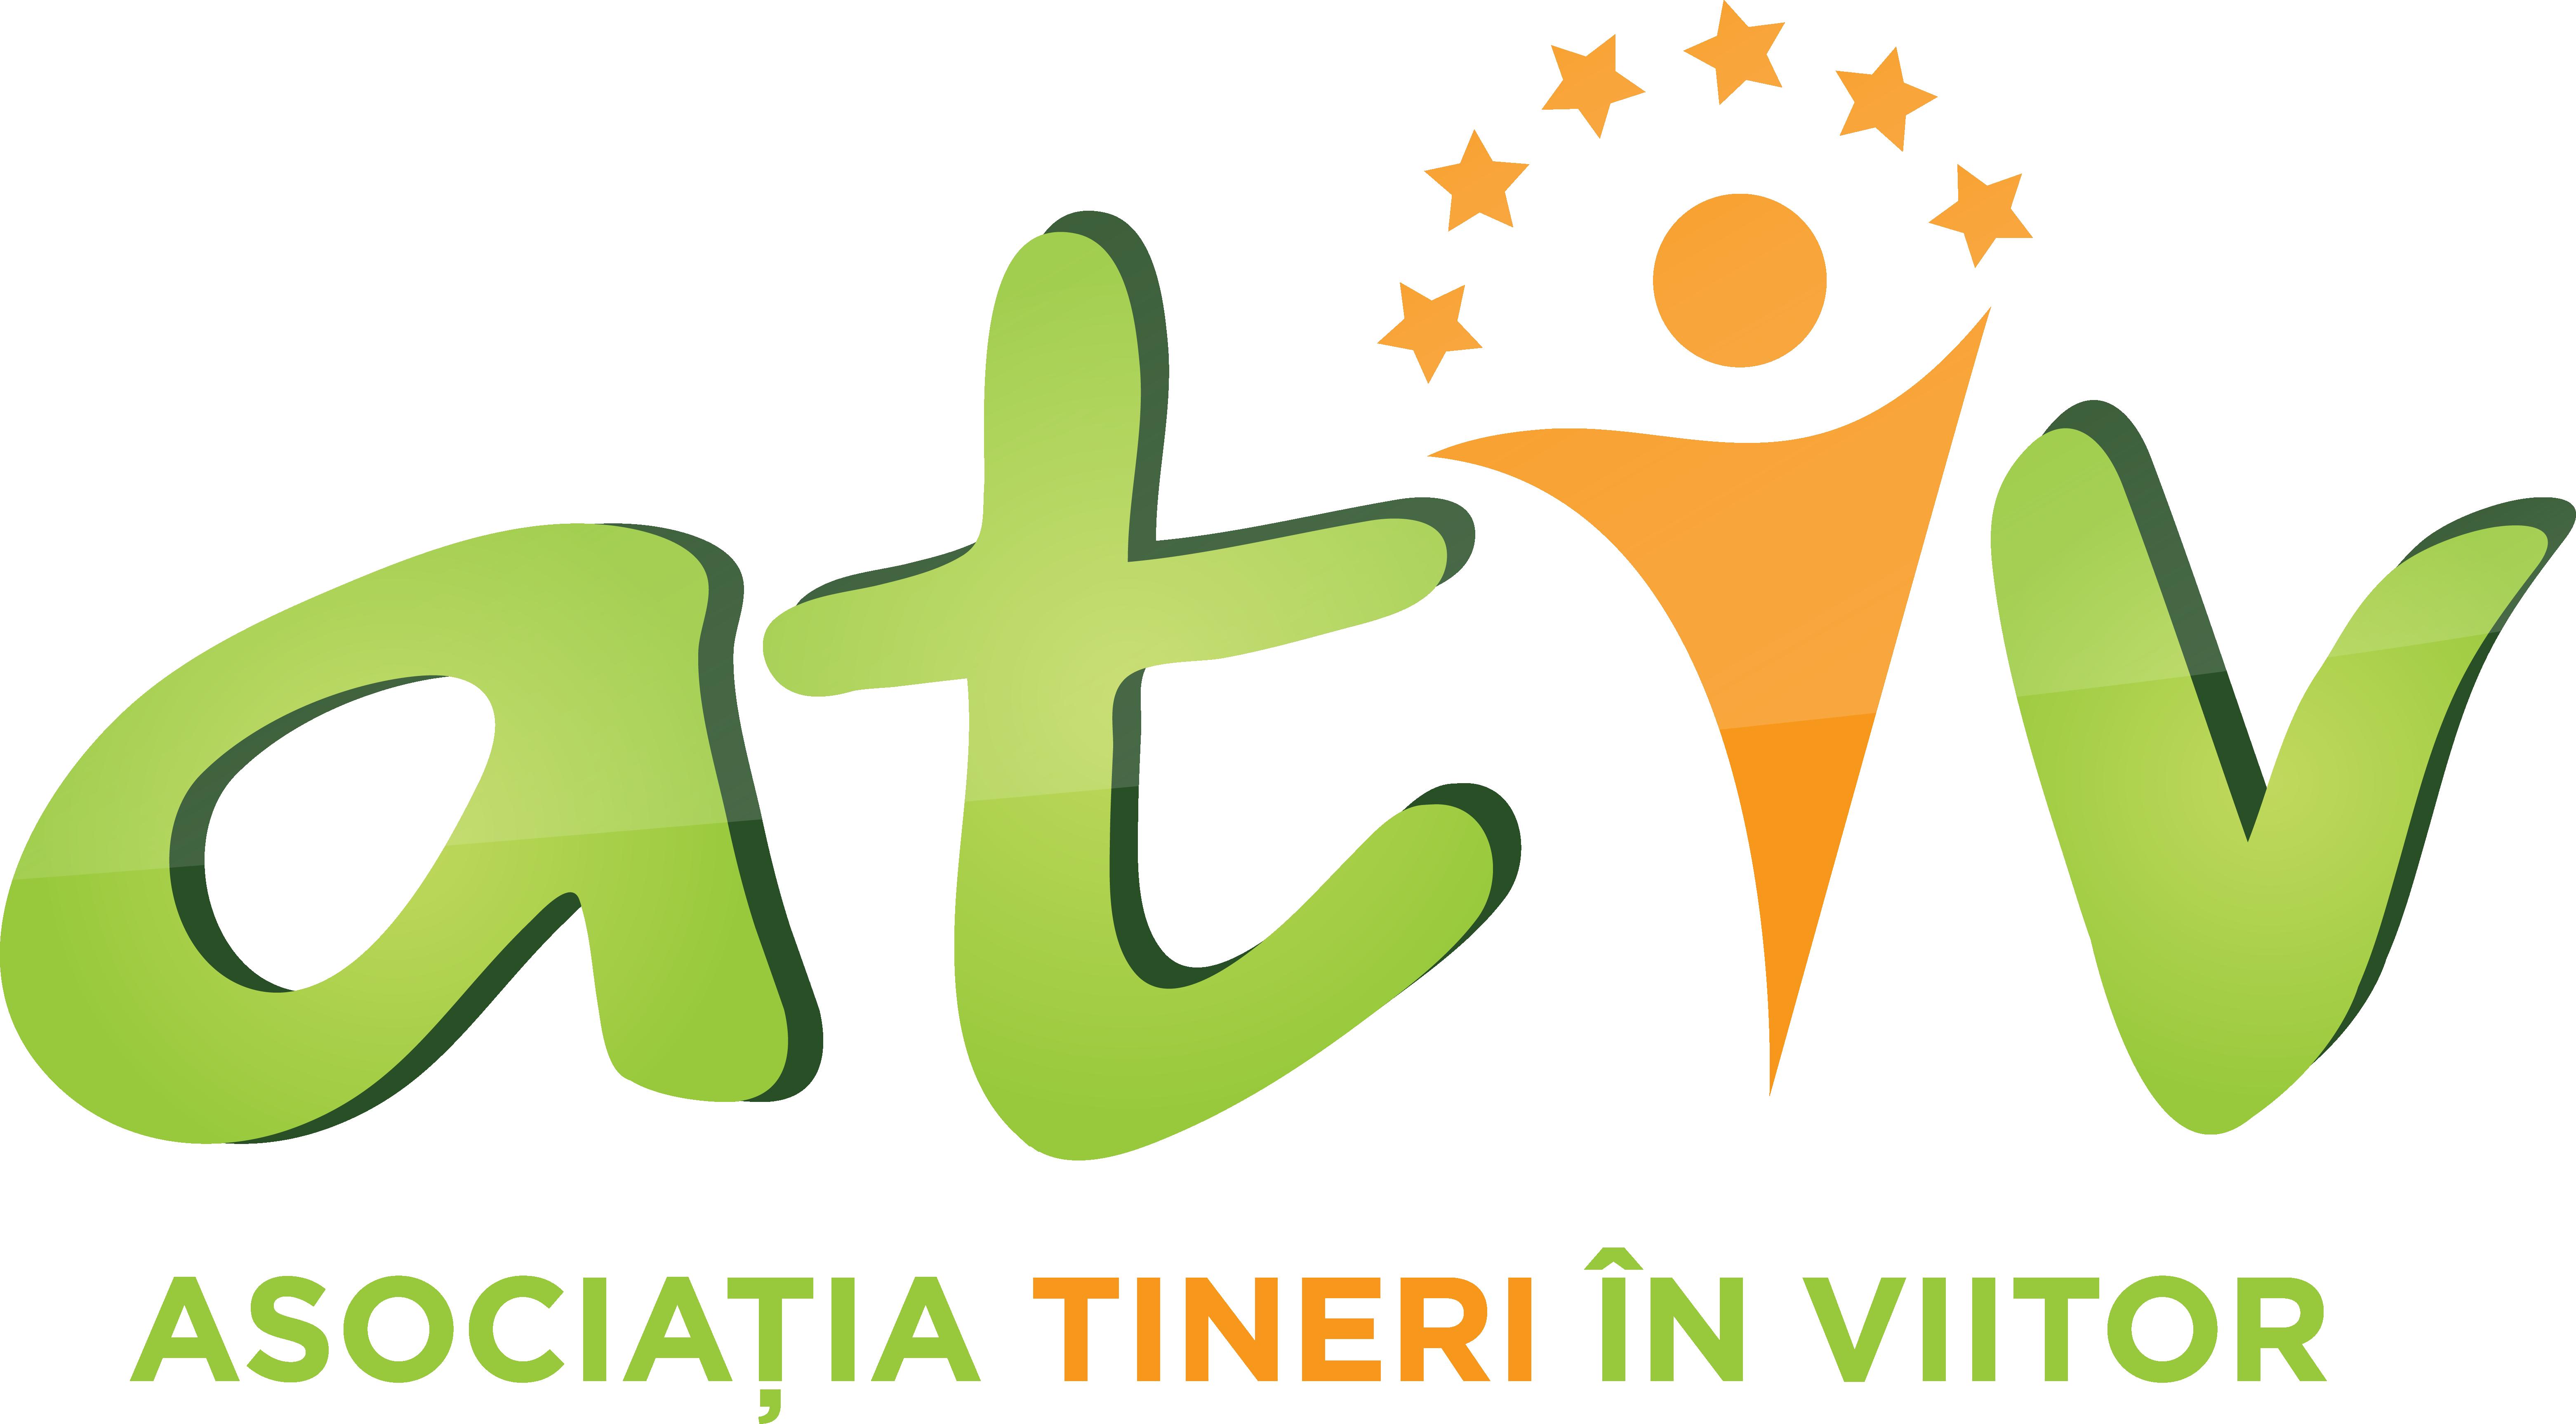 ASOCIATIA ATIV - TINERI IN VIITOR logo